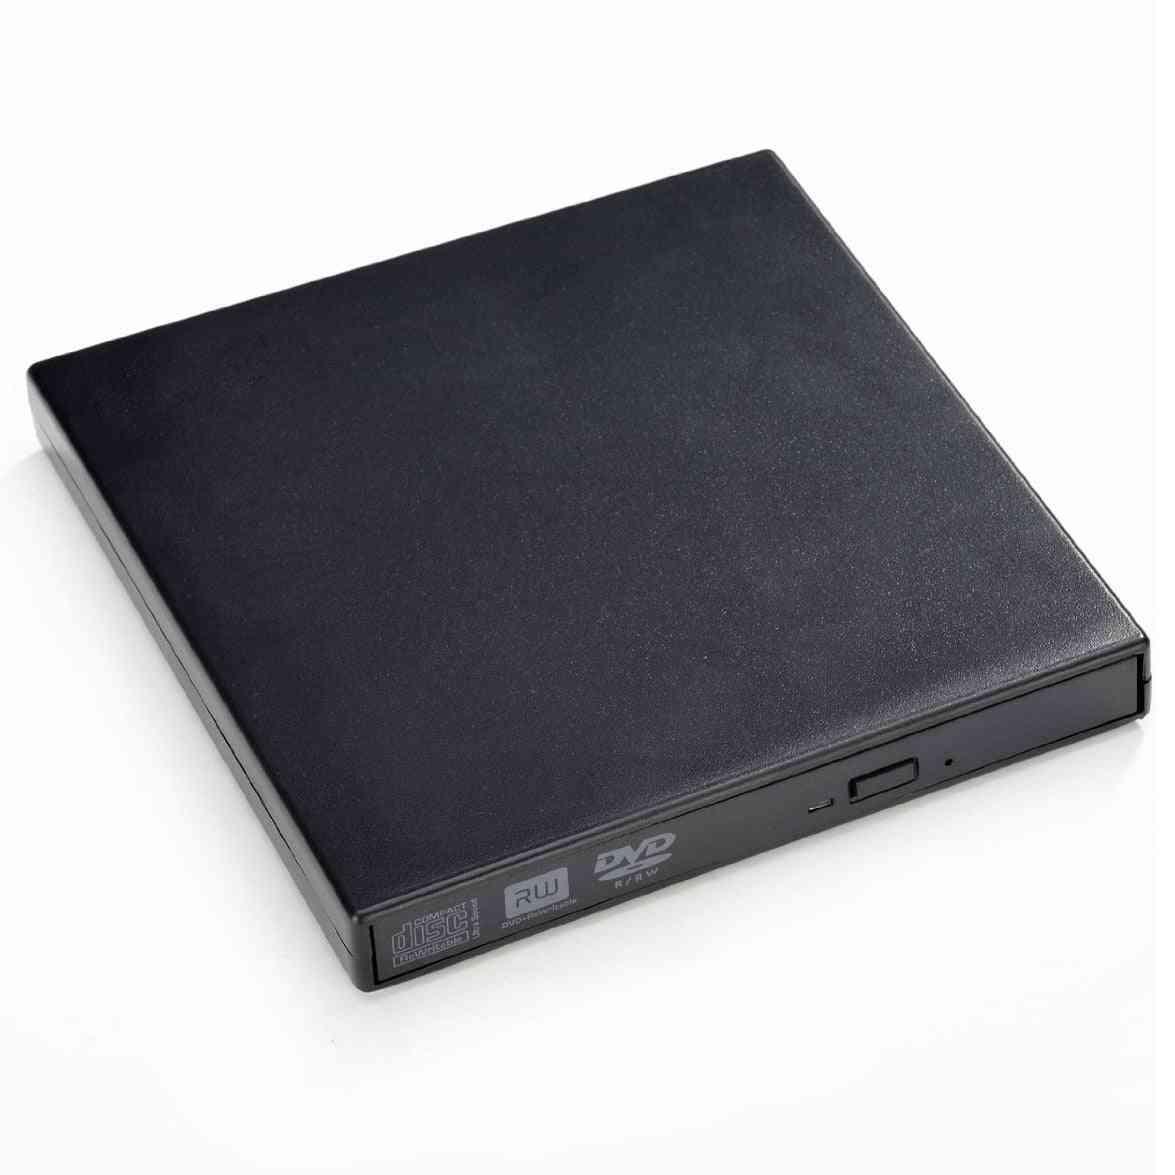 Portable Slim External Usb Dvdrom Burner Writer Optical Drive For Laptop/notebook/pc